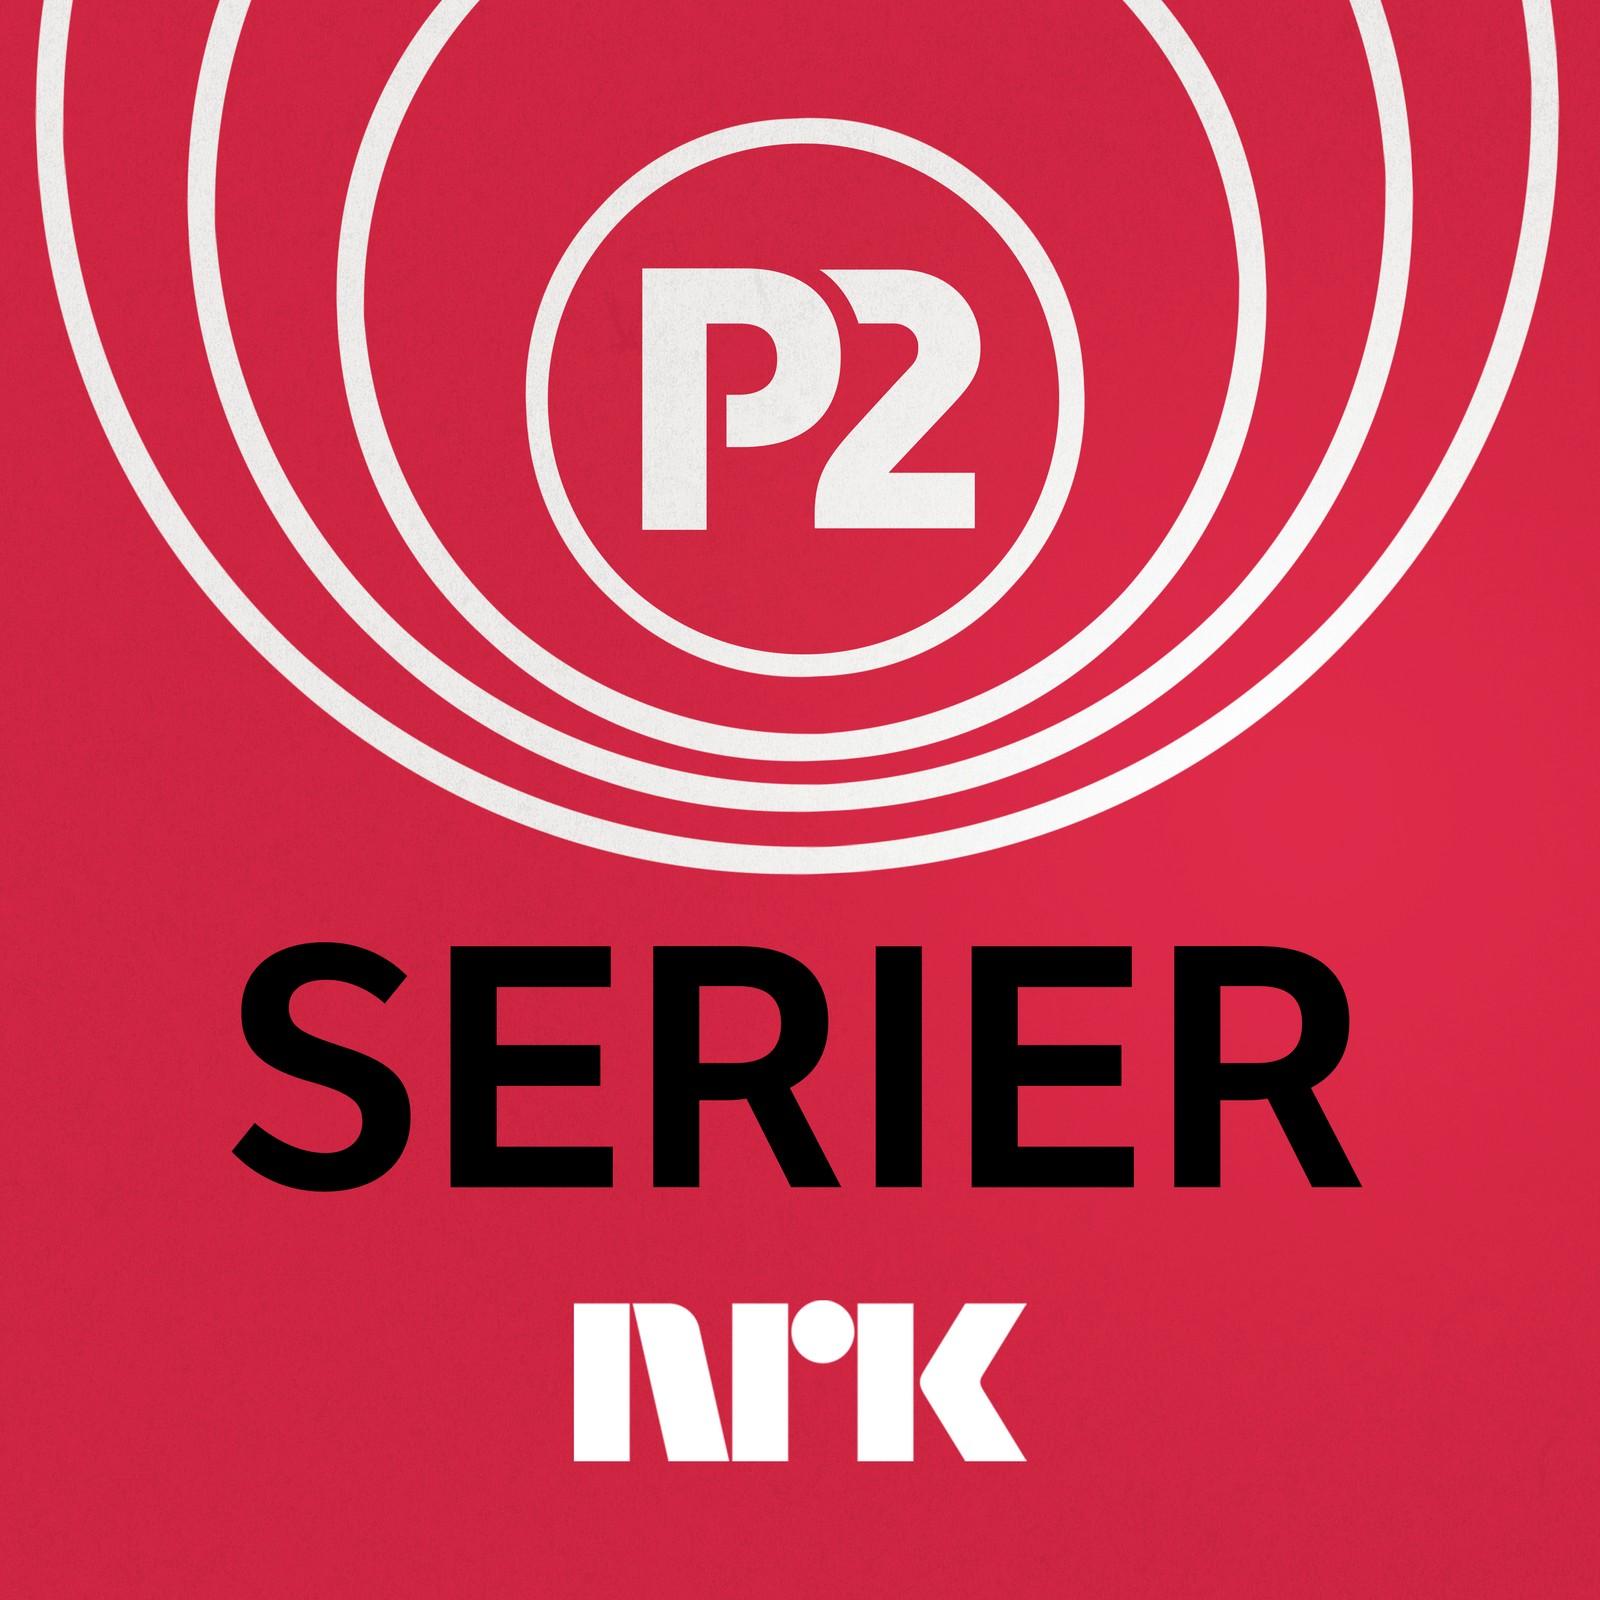 P2-serier